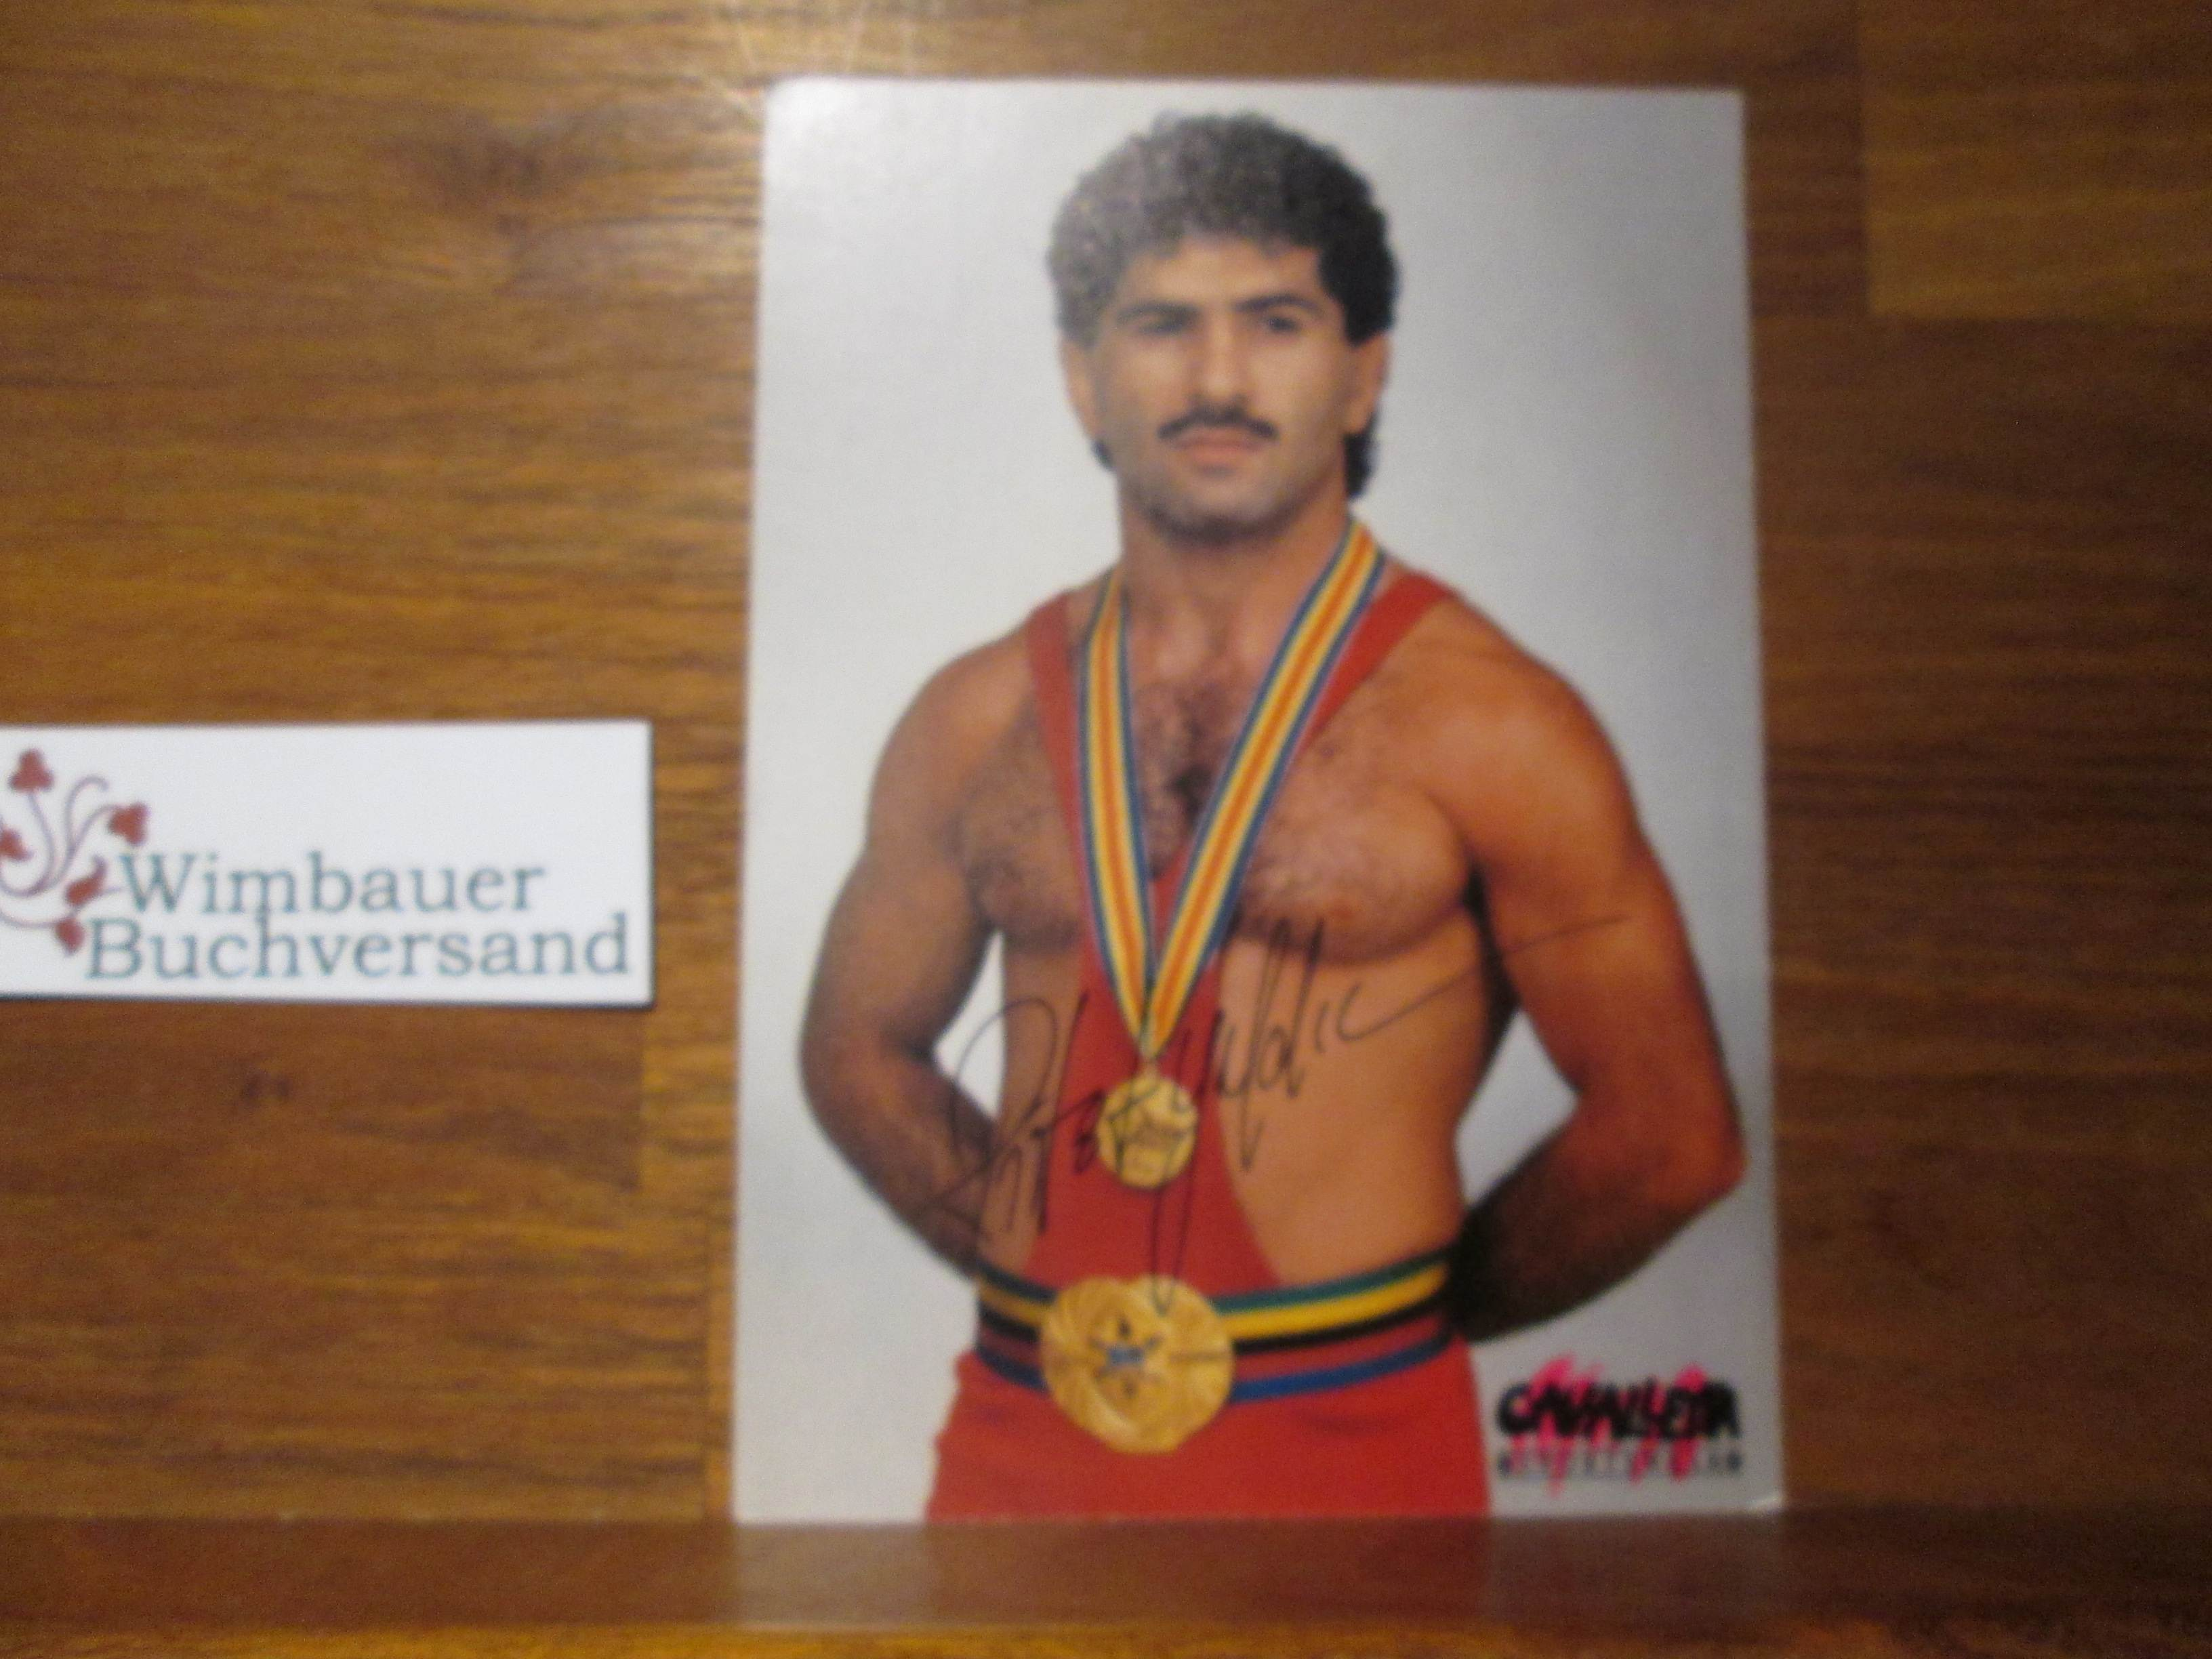 Original Autogramm Rifat Yildiz Ringen Olympia Weltmeister /// Autograph signiert signed signee